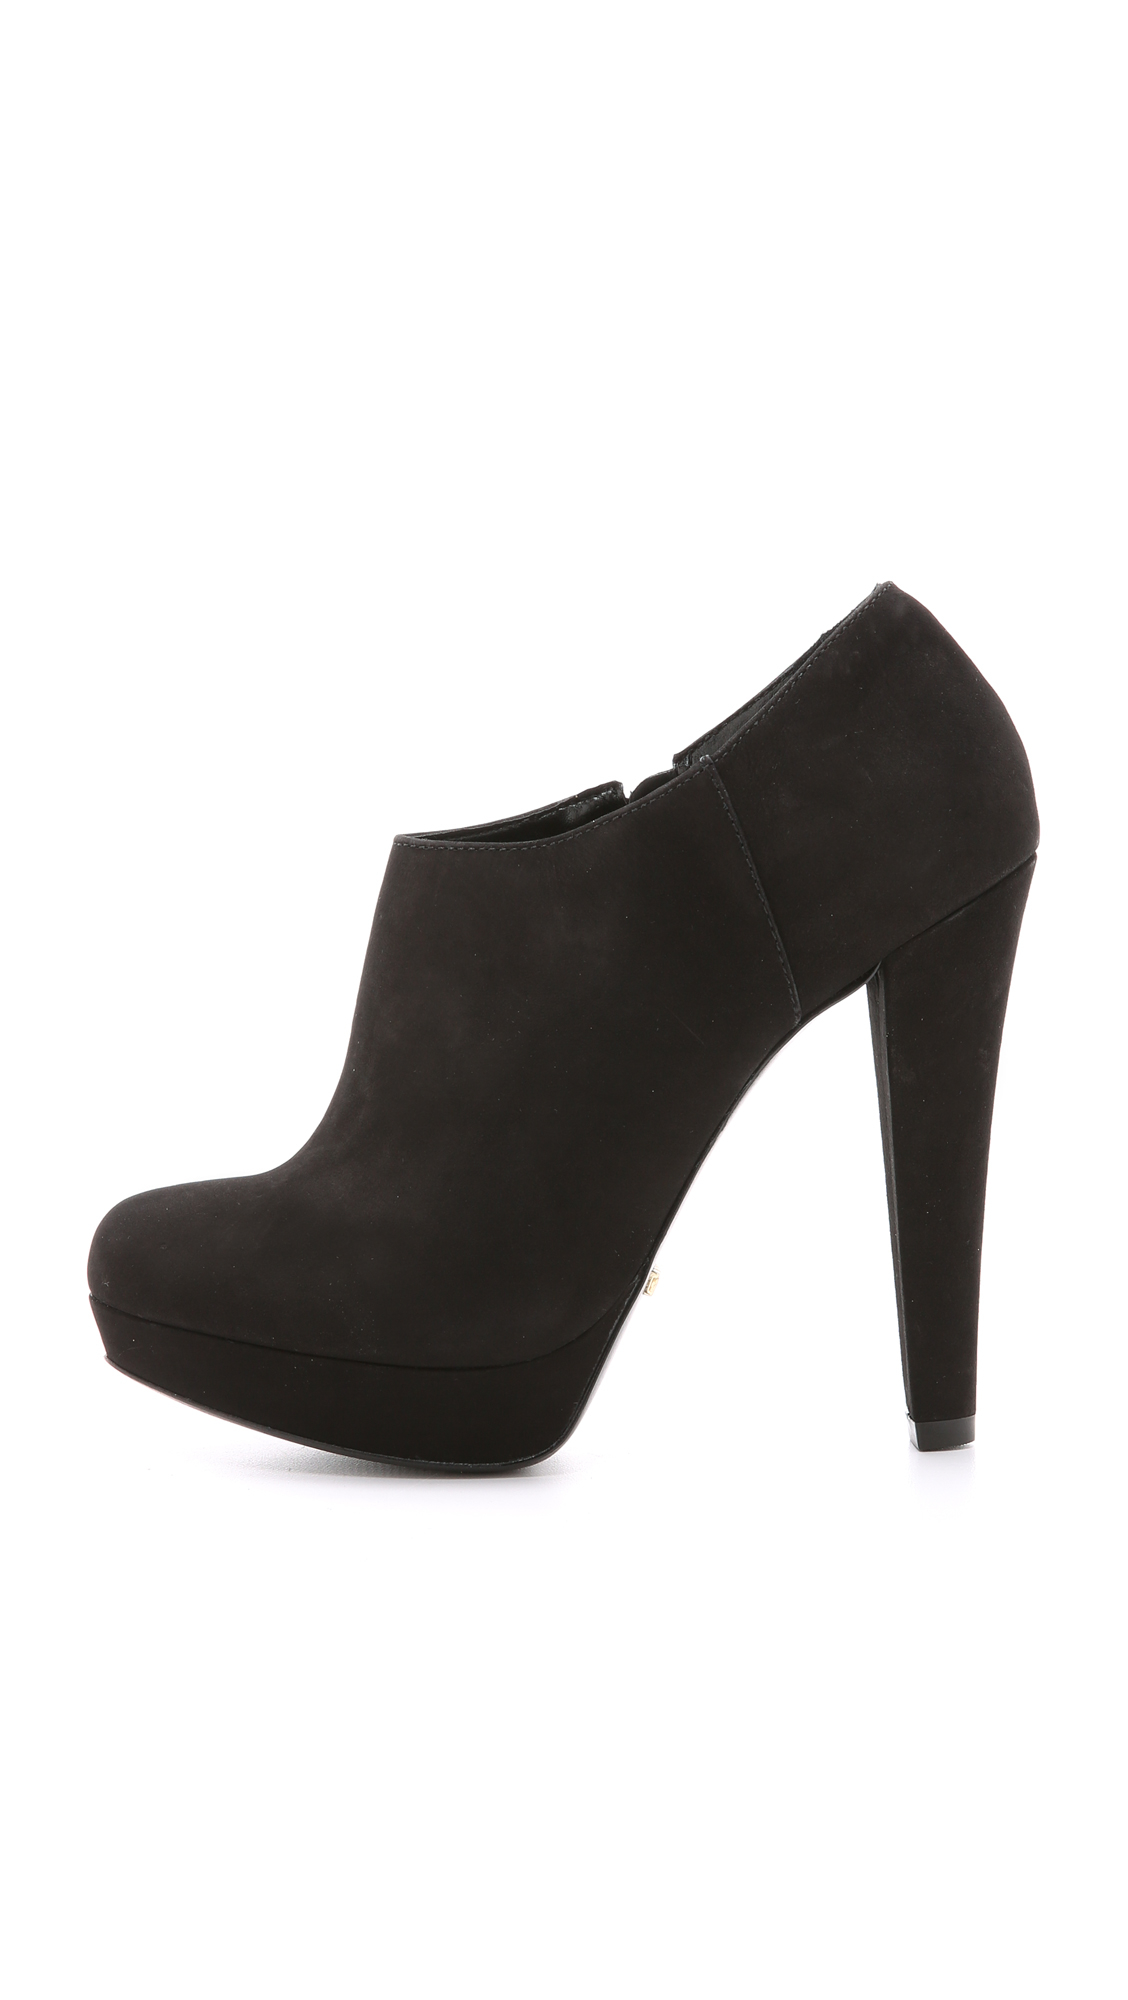 Schutz Kefera Ankle Booties - Black